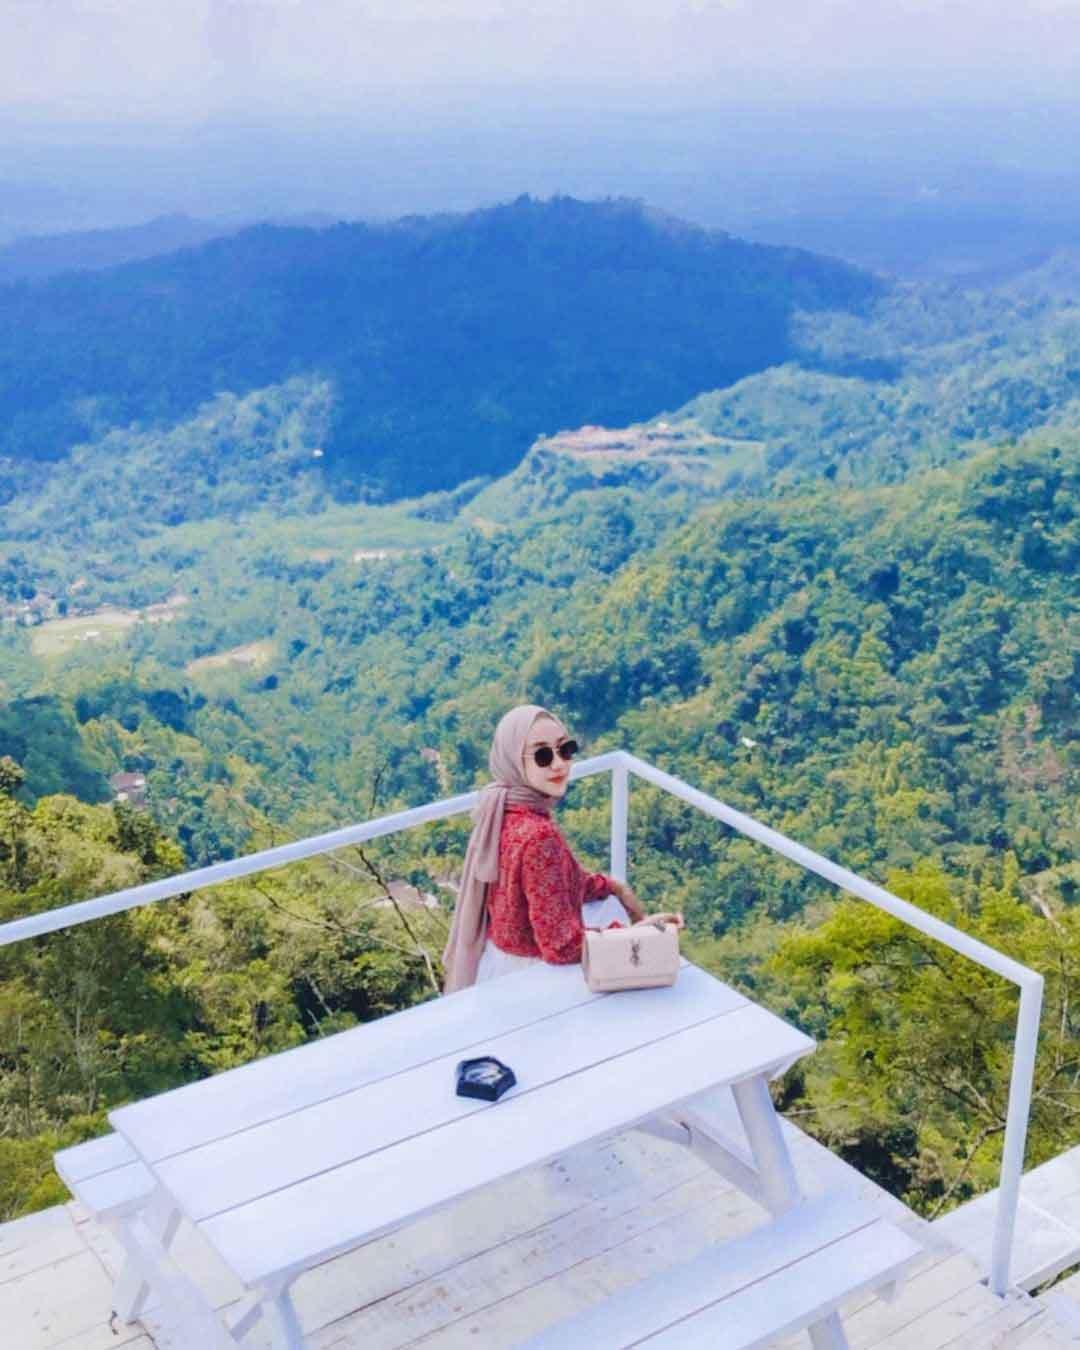 Menikmati Pemandangan Di Tumpeng Menoreh Kulon Progo Image From @selfiekumala